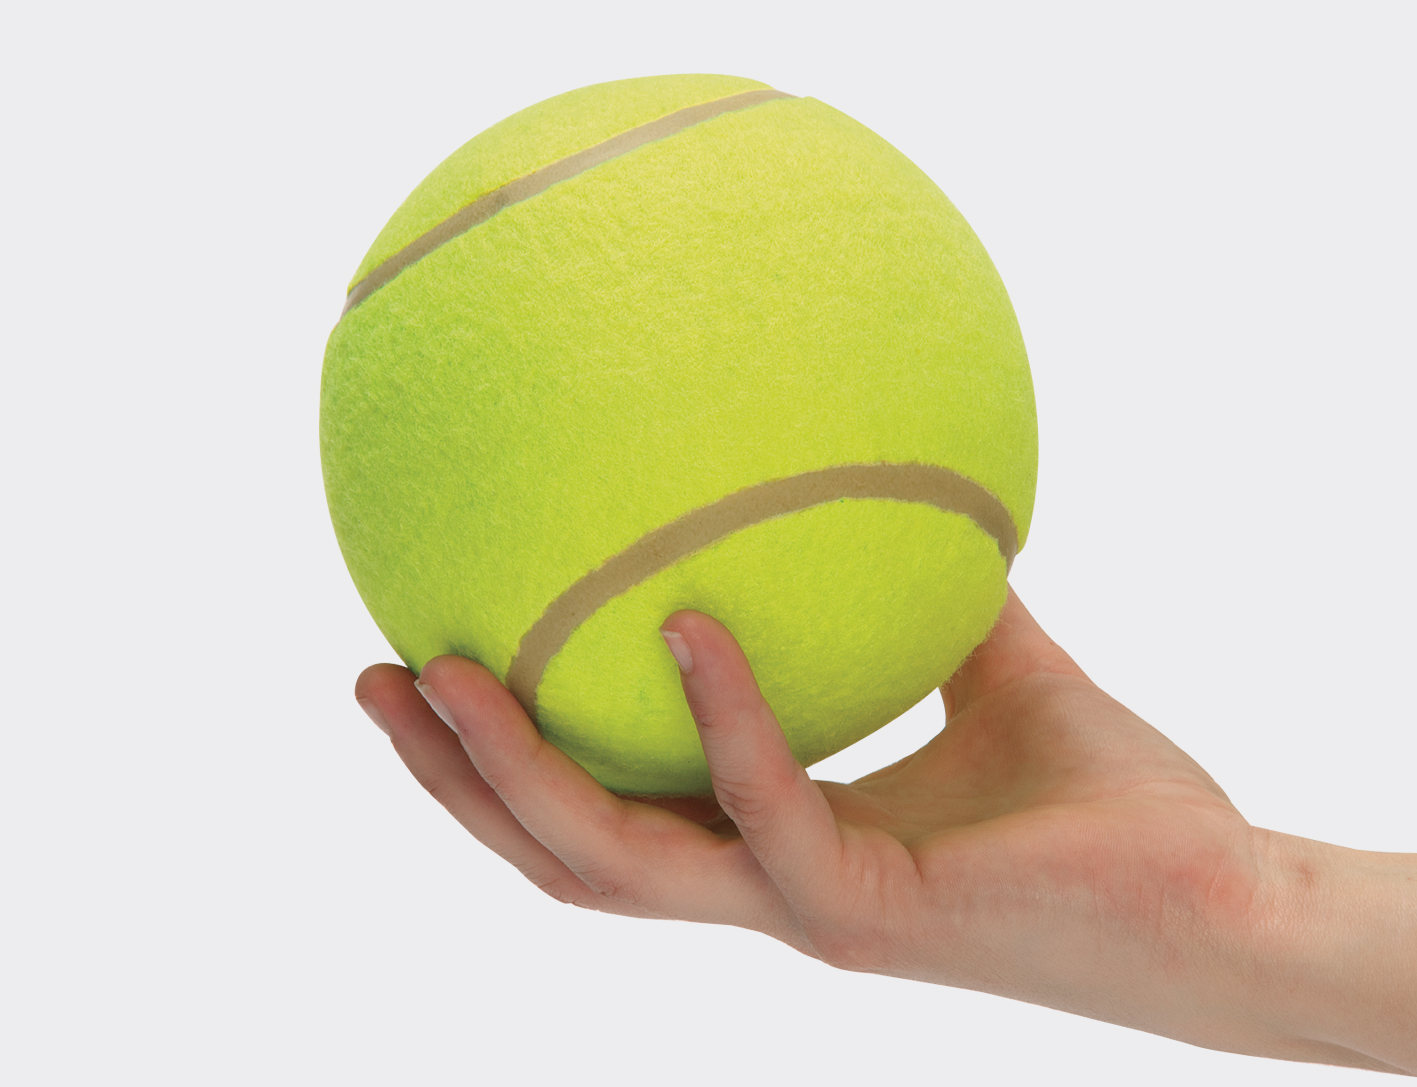 Balls Archives Slater Gartrell Sports